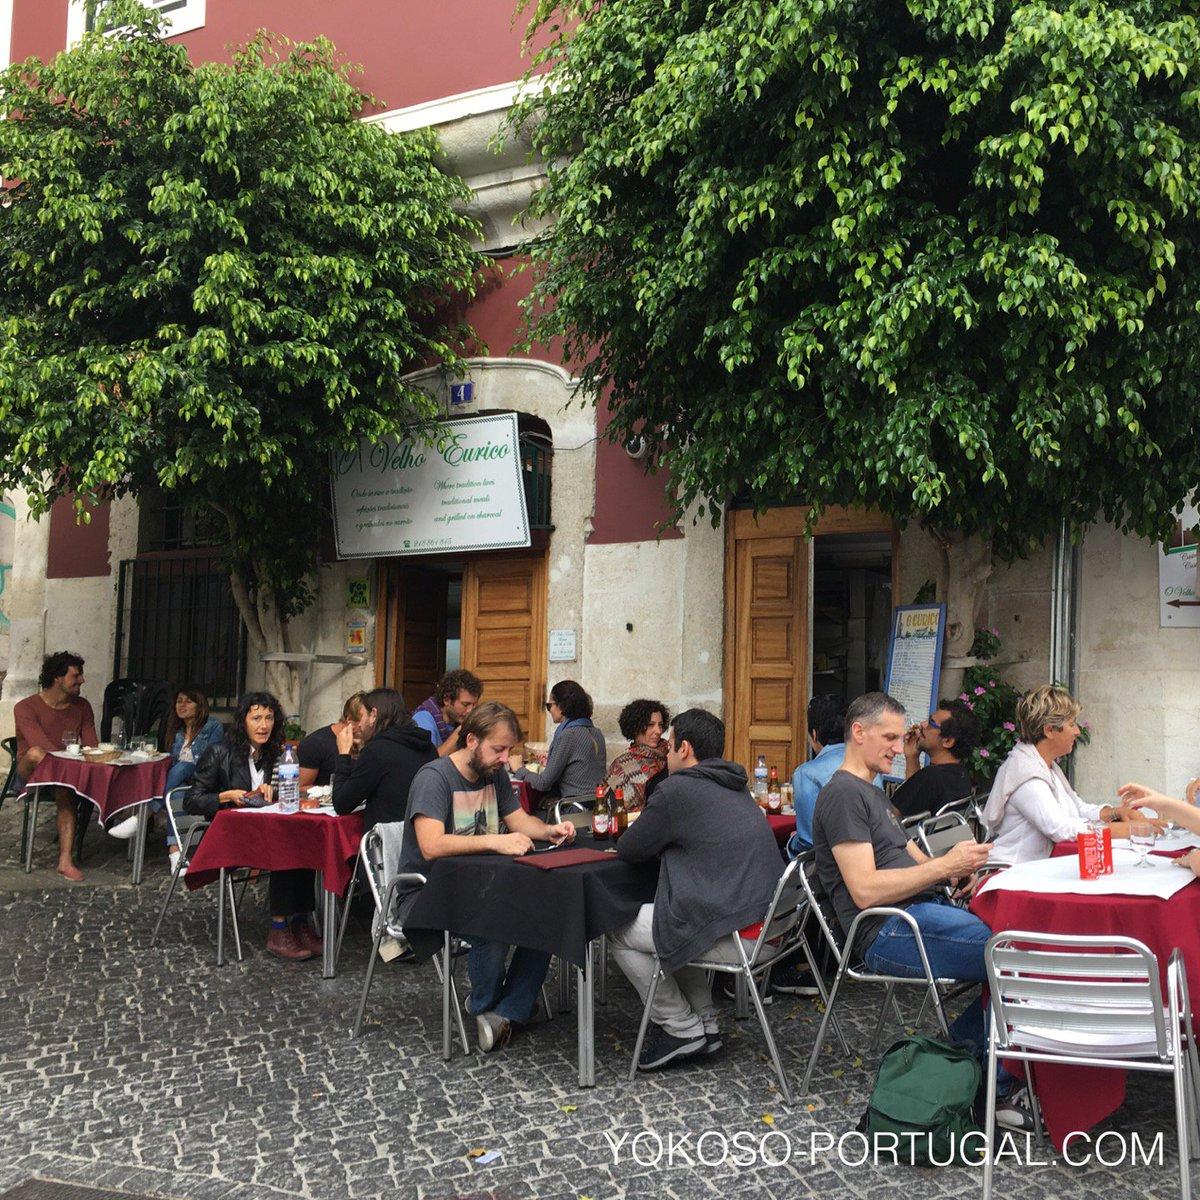 test ツイッターメディア - リスボンのおすすめレストラン。ポルトガル料理のメニュー豊富で、お値段もリーズナブル。 (@ O Eurico in Lisboa) https://t.co/H8M35ifGa7 https://t.co/kDGteLVZPe